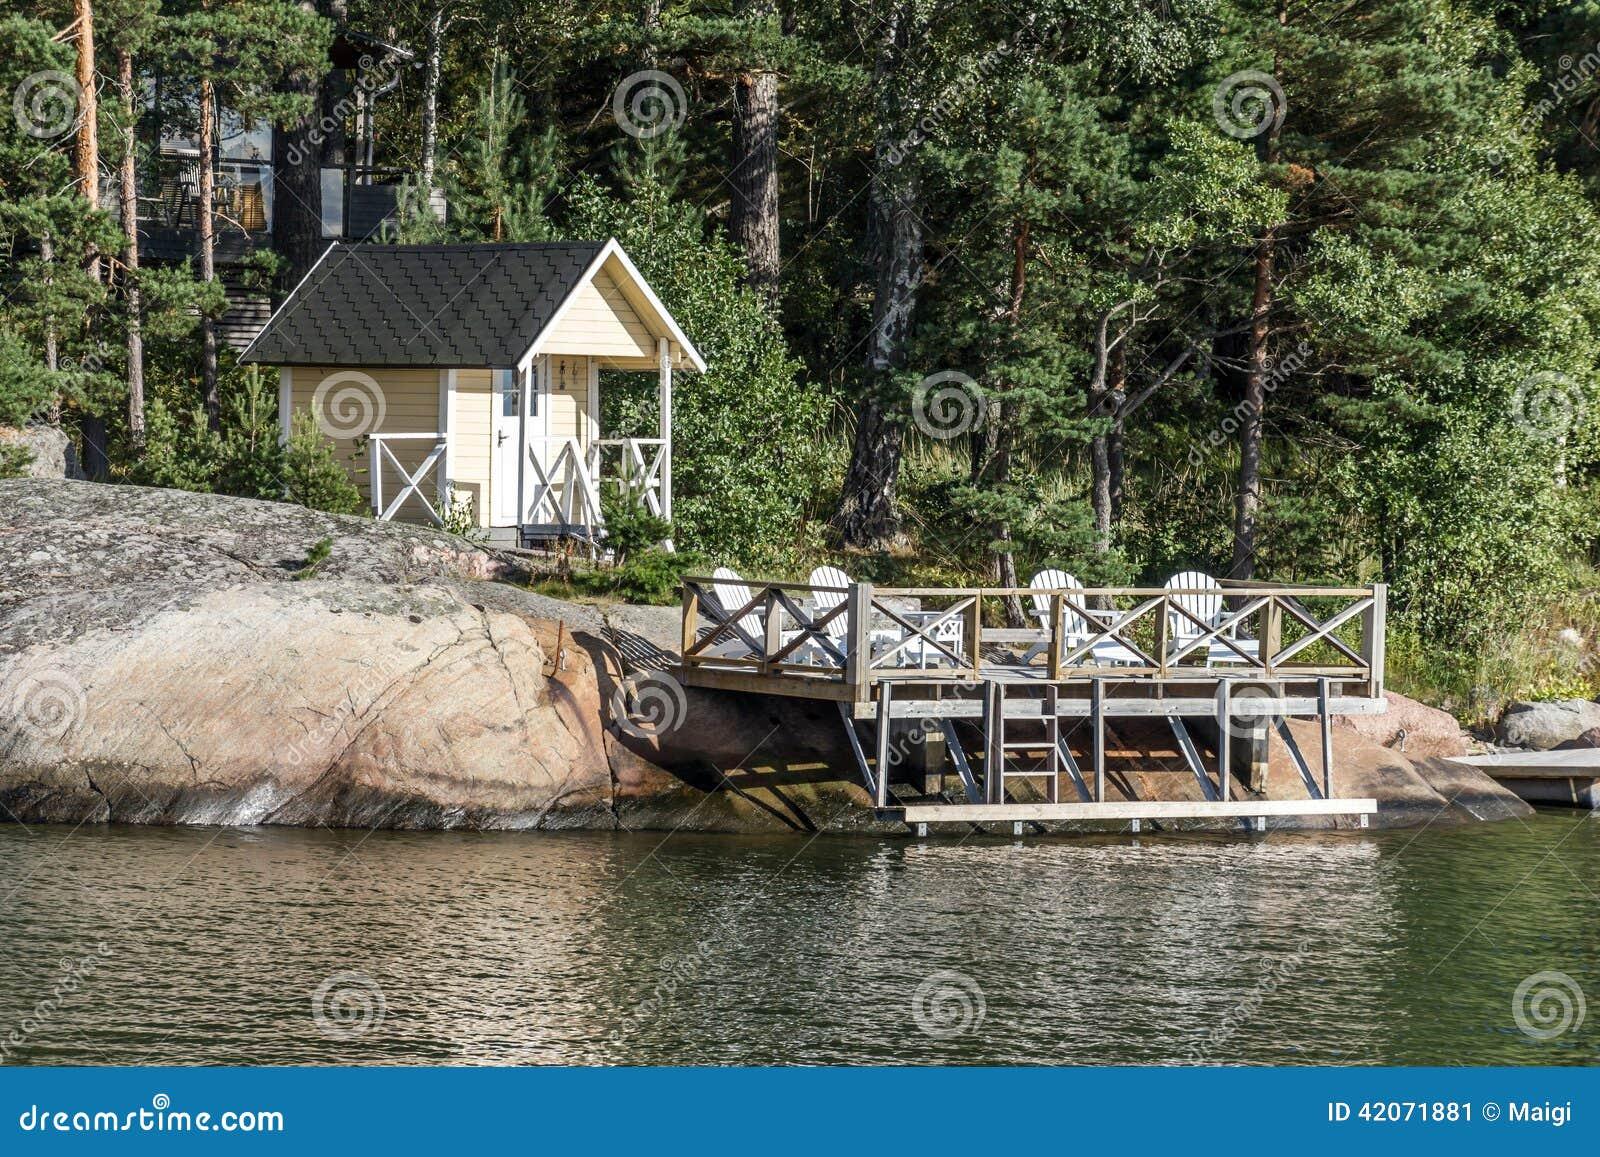 Download Sauna Building stock image. Image of peaceful, sauna - 42071881